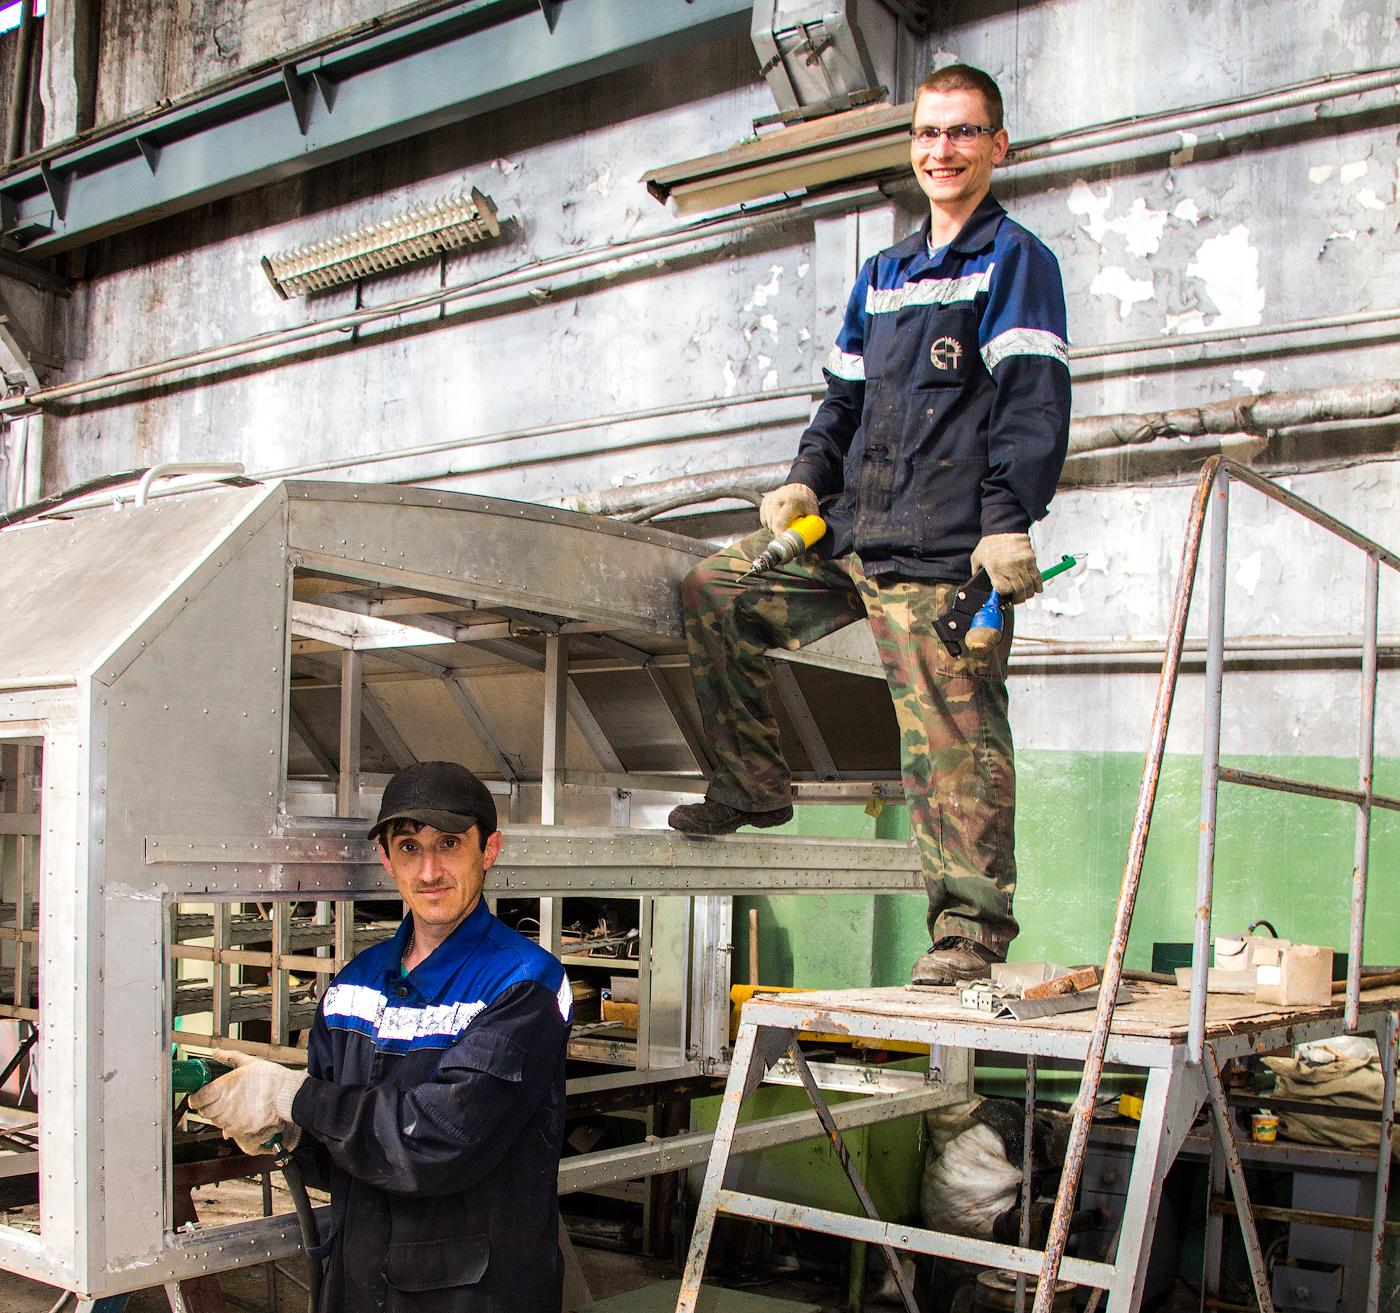 Слесари 3 цеха Вячеслав Пивовар и Александр Климин проводят работы по ремонту каркаса машины.